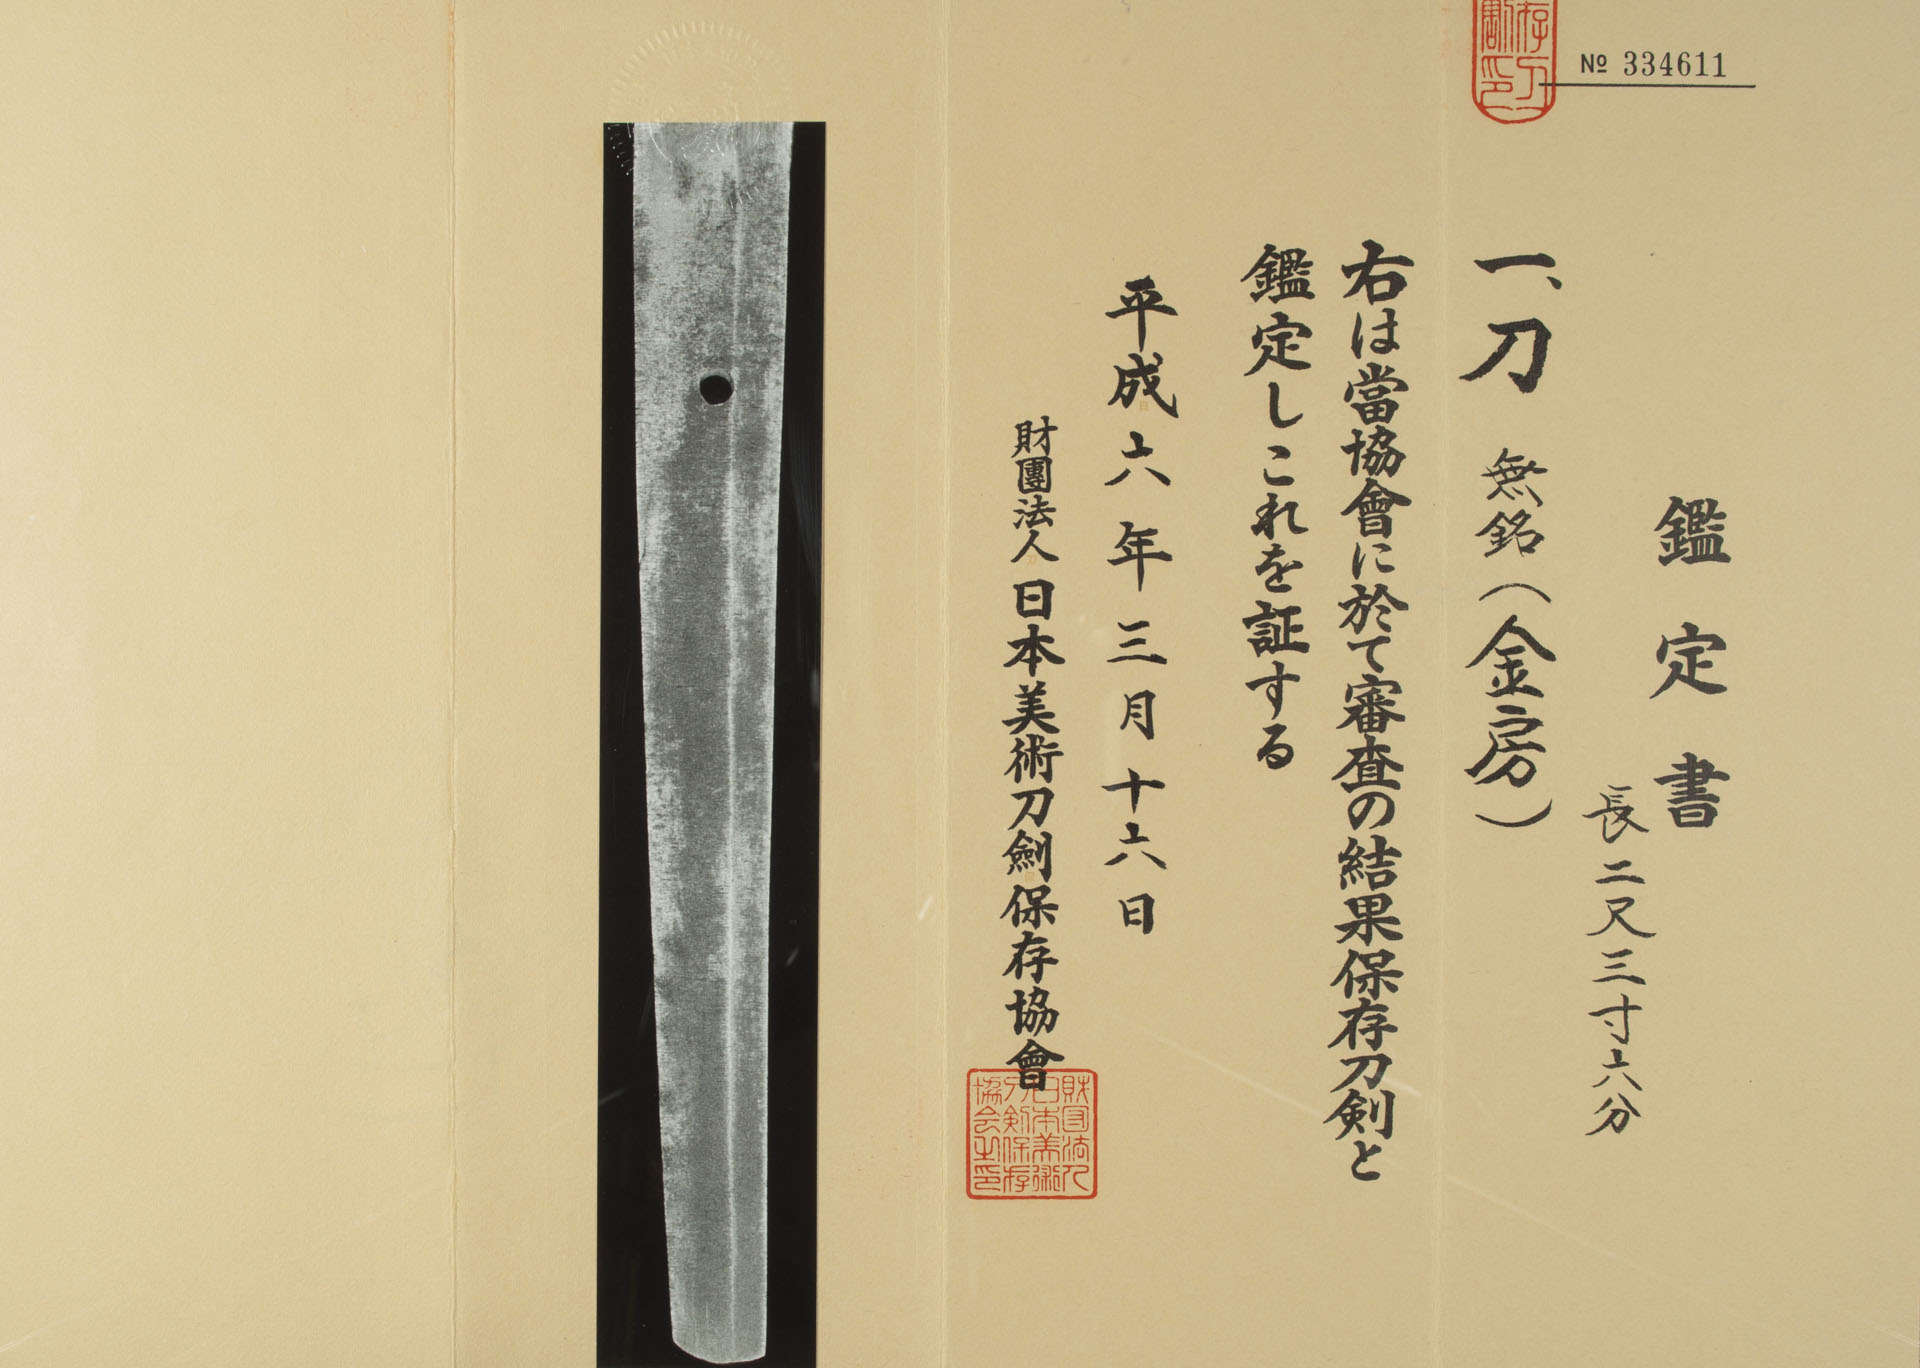 yamato-kanabo-katana-16